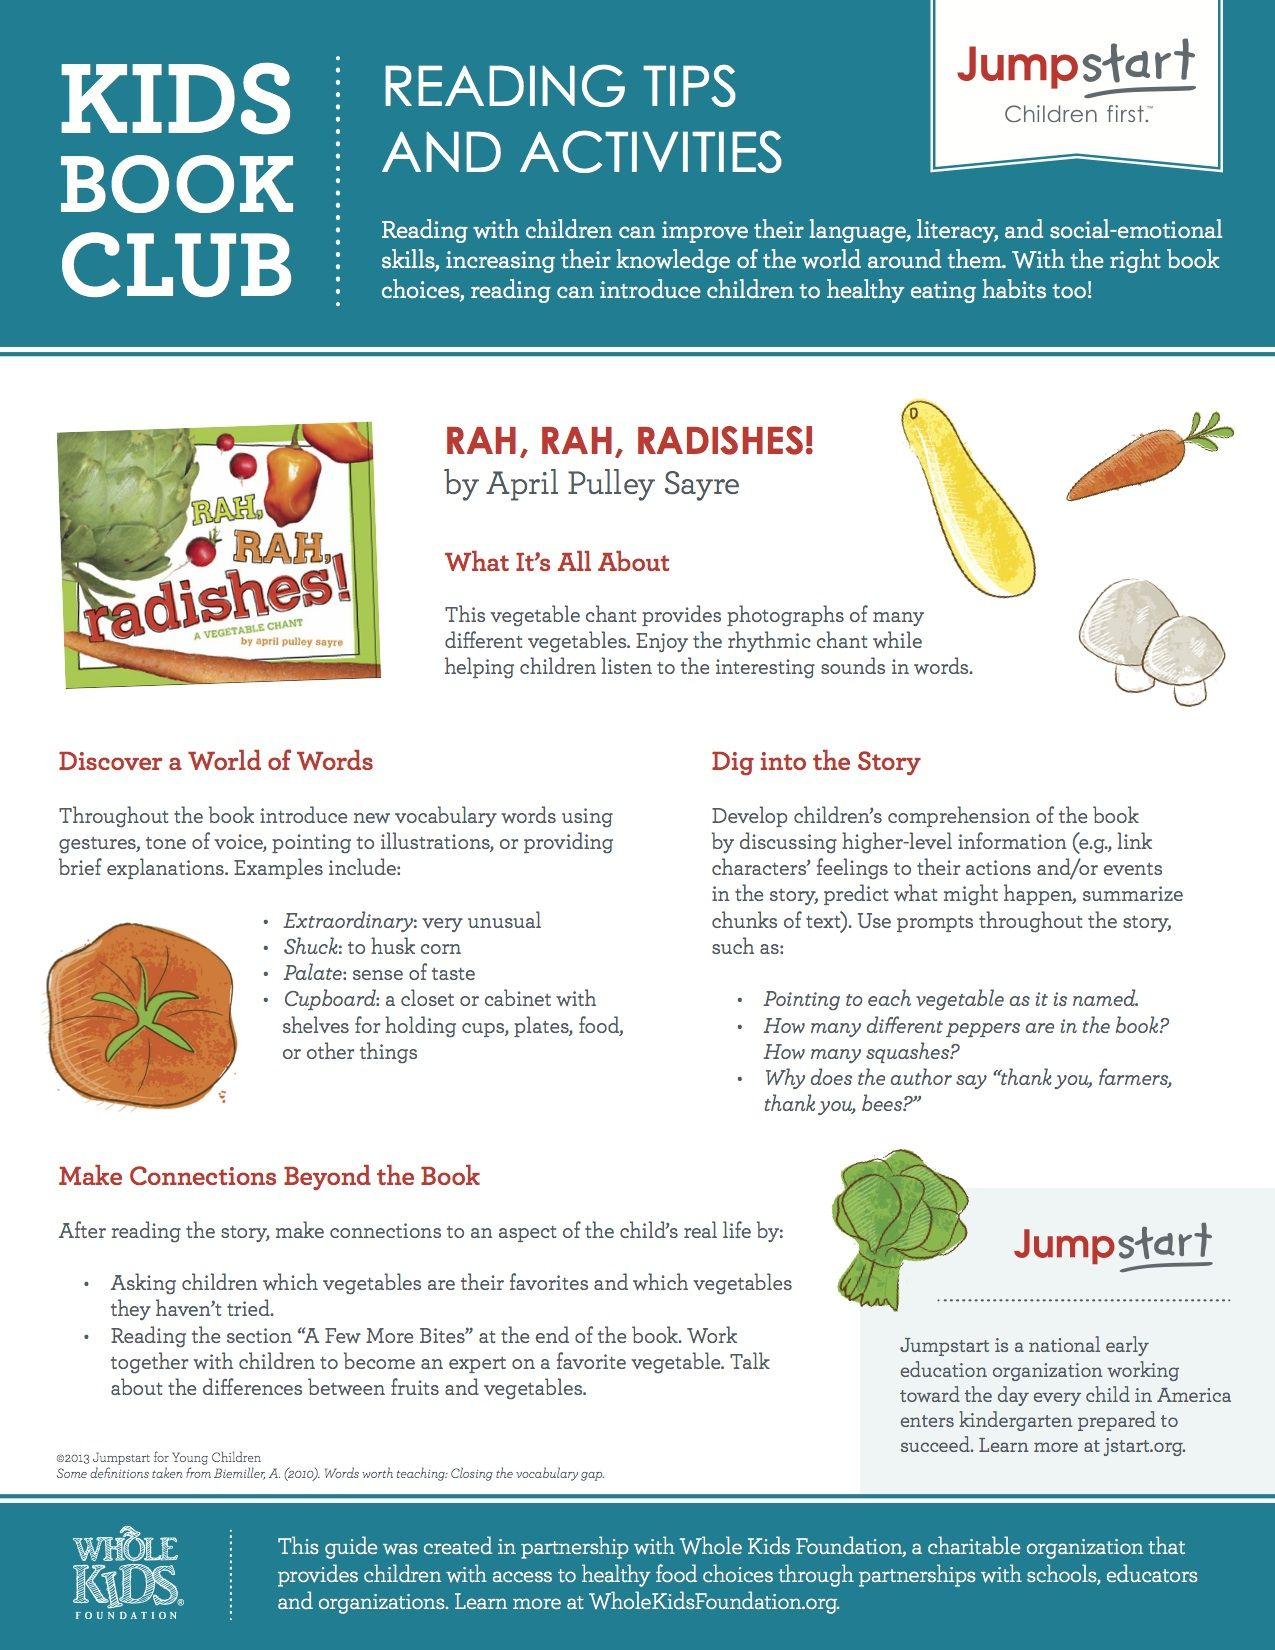 Rah Rah Radishes A Vegetable Chant Reading Tips